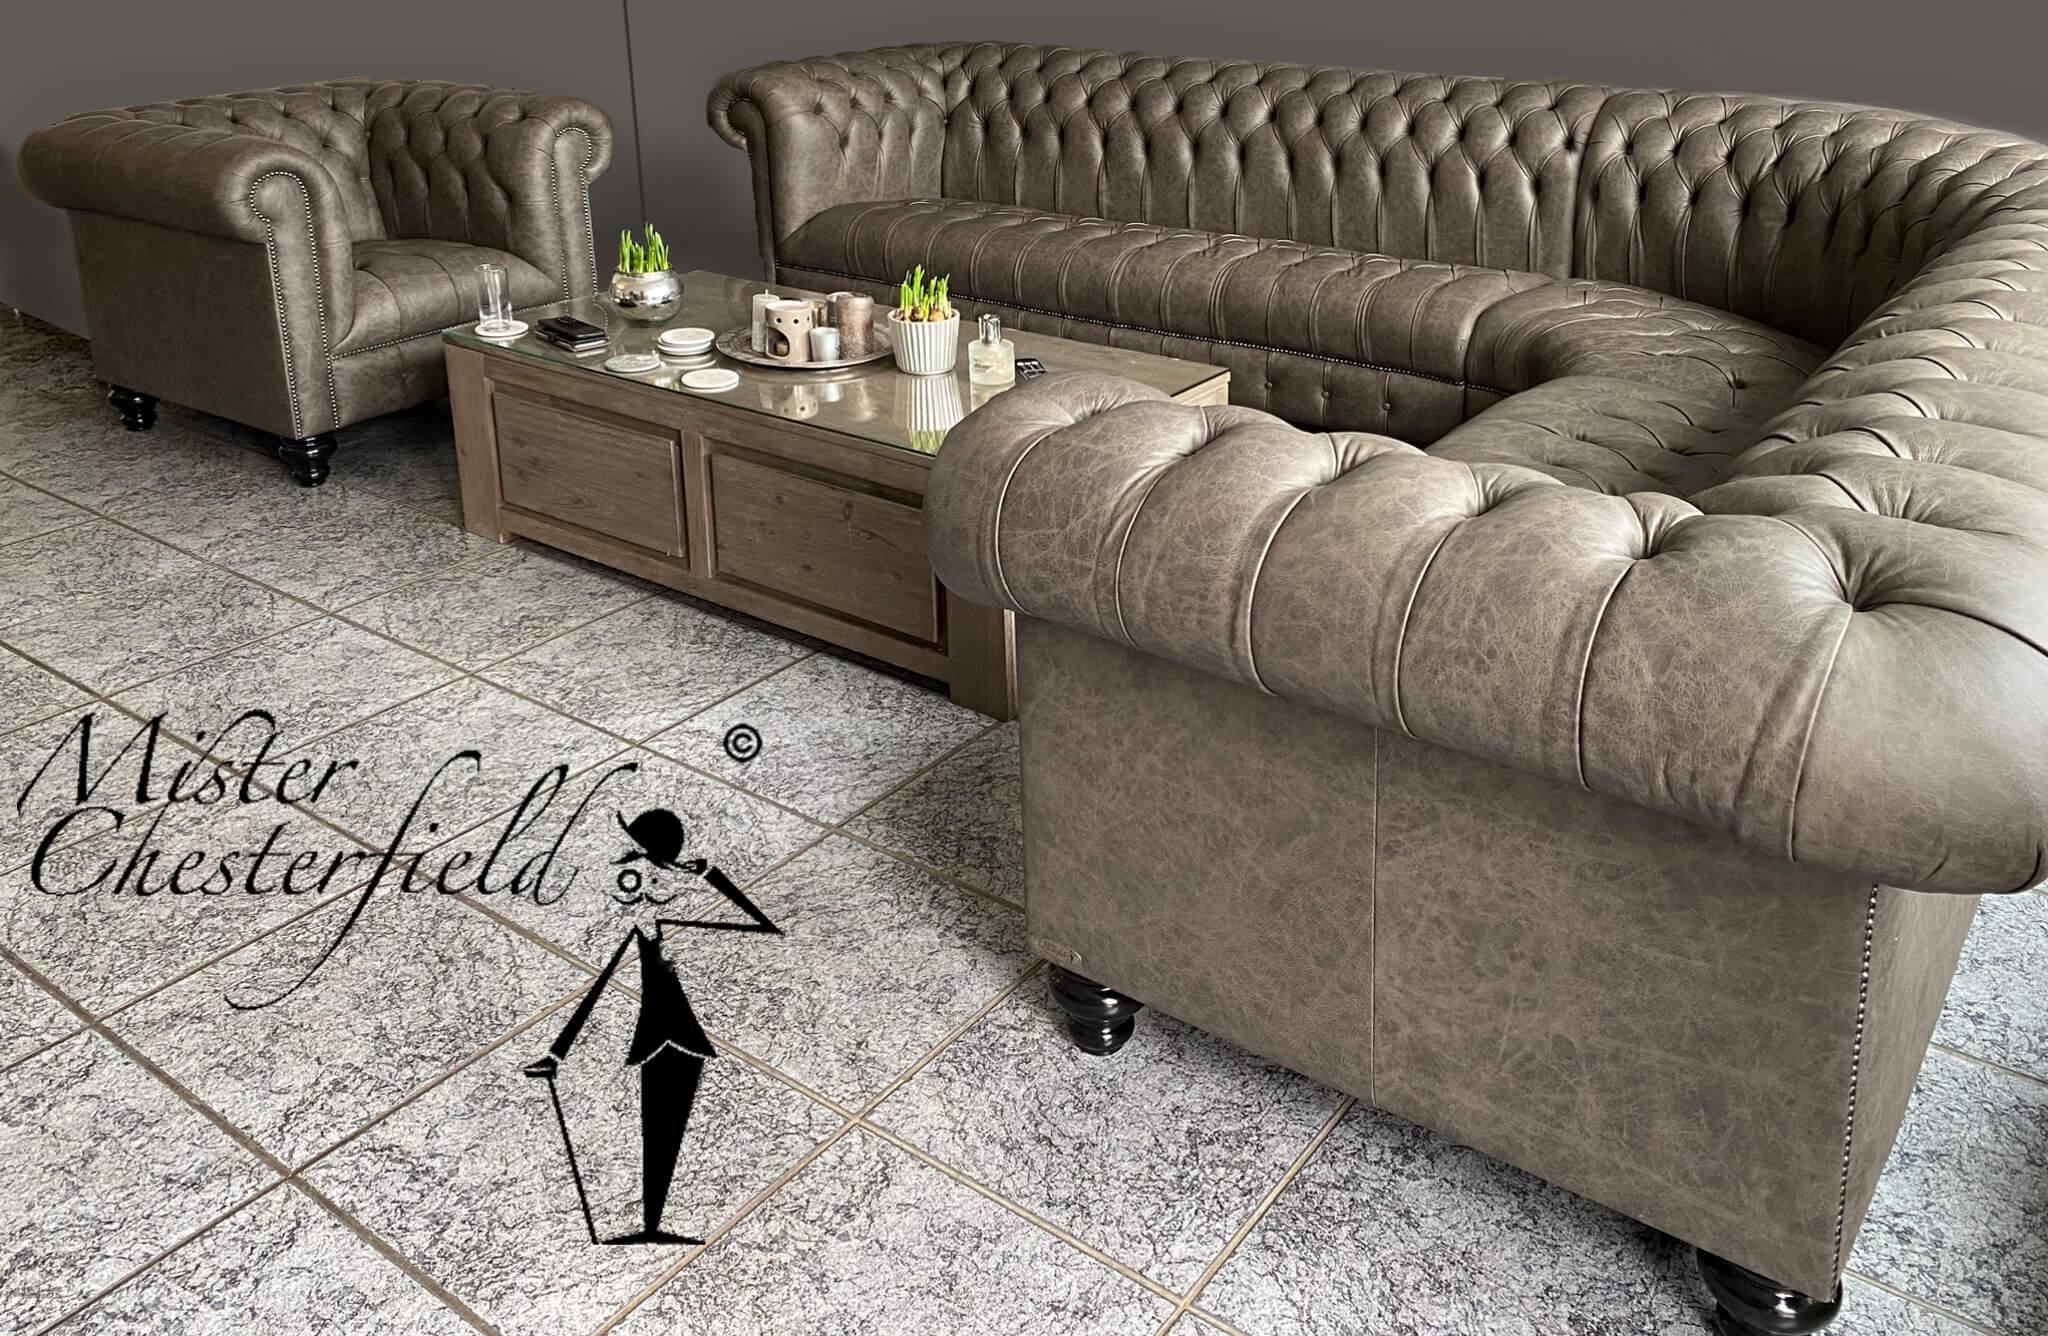 fotoboek-chesterfield-corner-sofa-kingston-Forrest-vintage-taupé-coal-sprung-seat